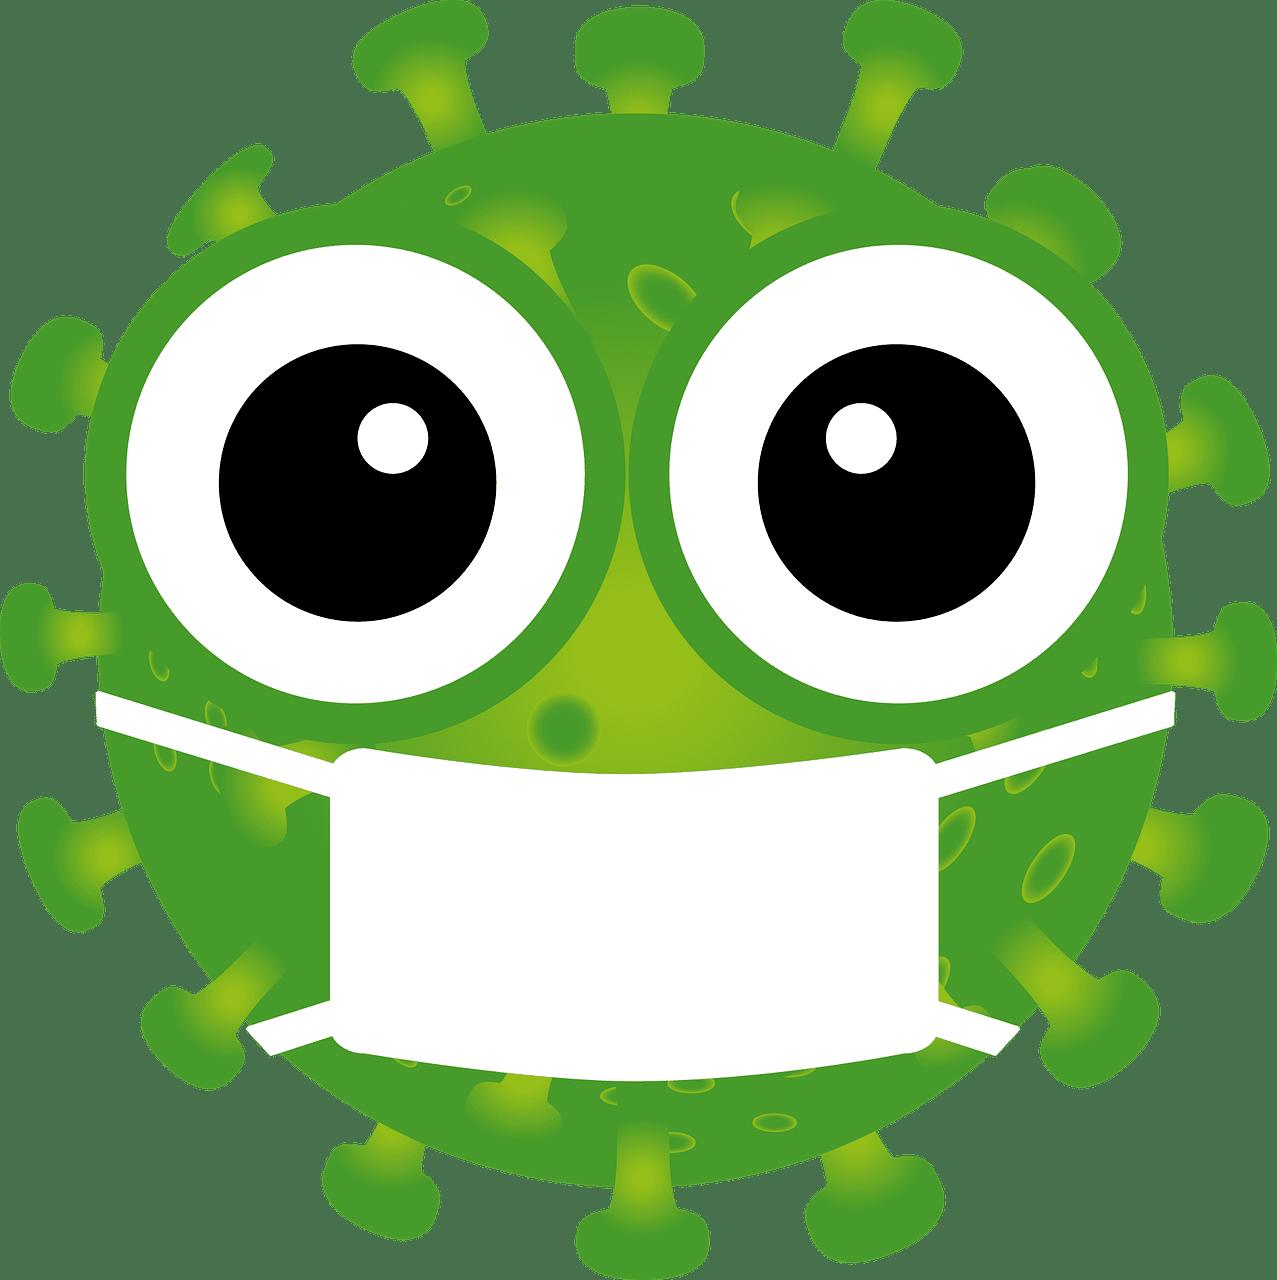 Coronavirus Covid-19 logo symbol face mask cartoon | Inside Pulse